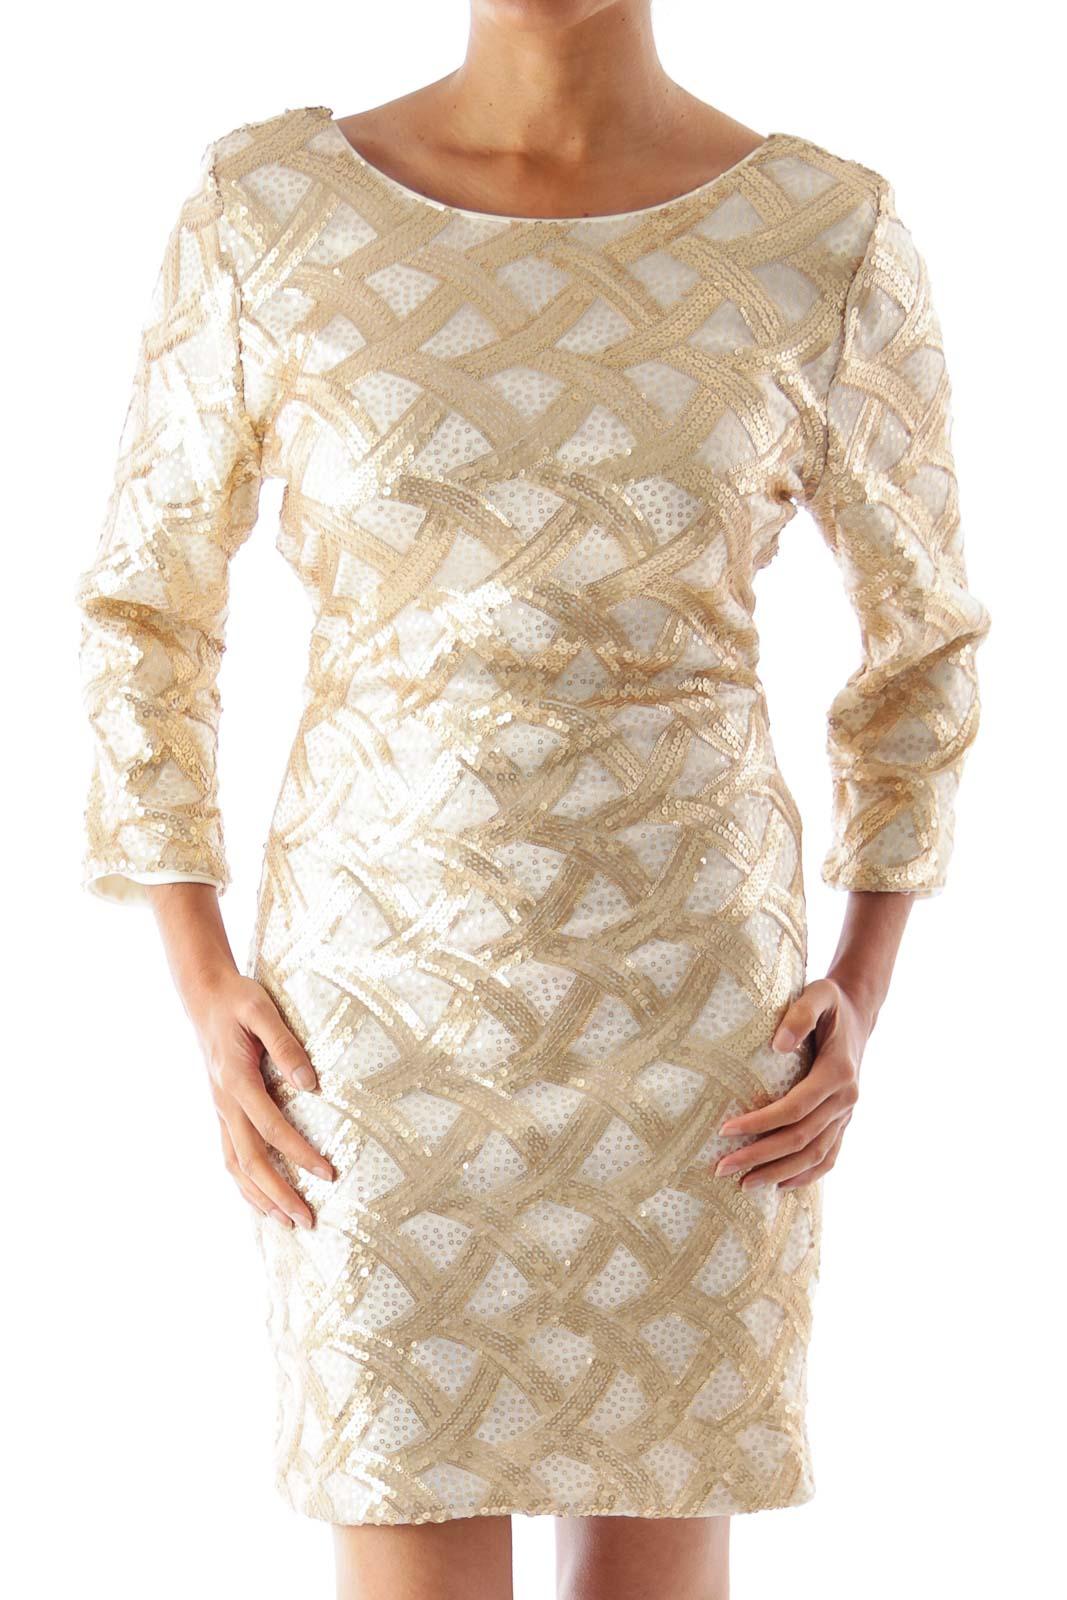 Gold Sequin Mini Dress Front